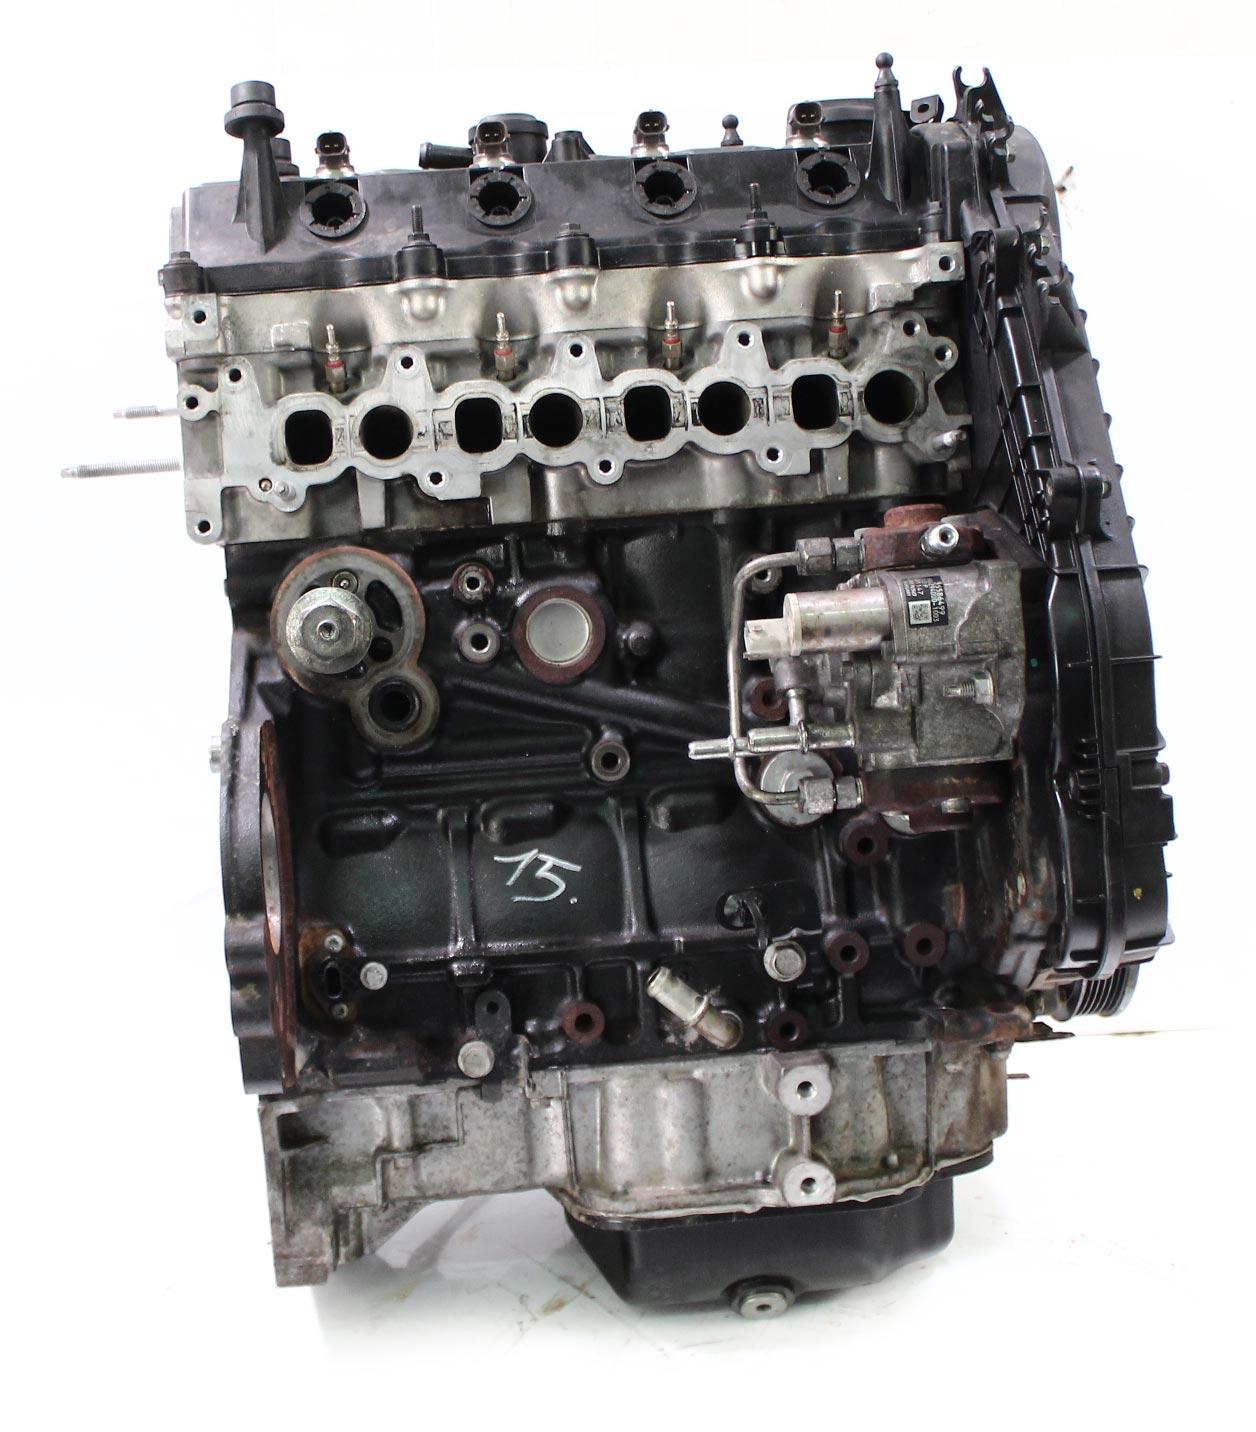 Motor 2013 Opel Astra GTC J Corsa D Meriva B Mokka 1,7 CDTI Diesel A17DTS